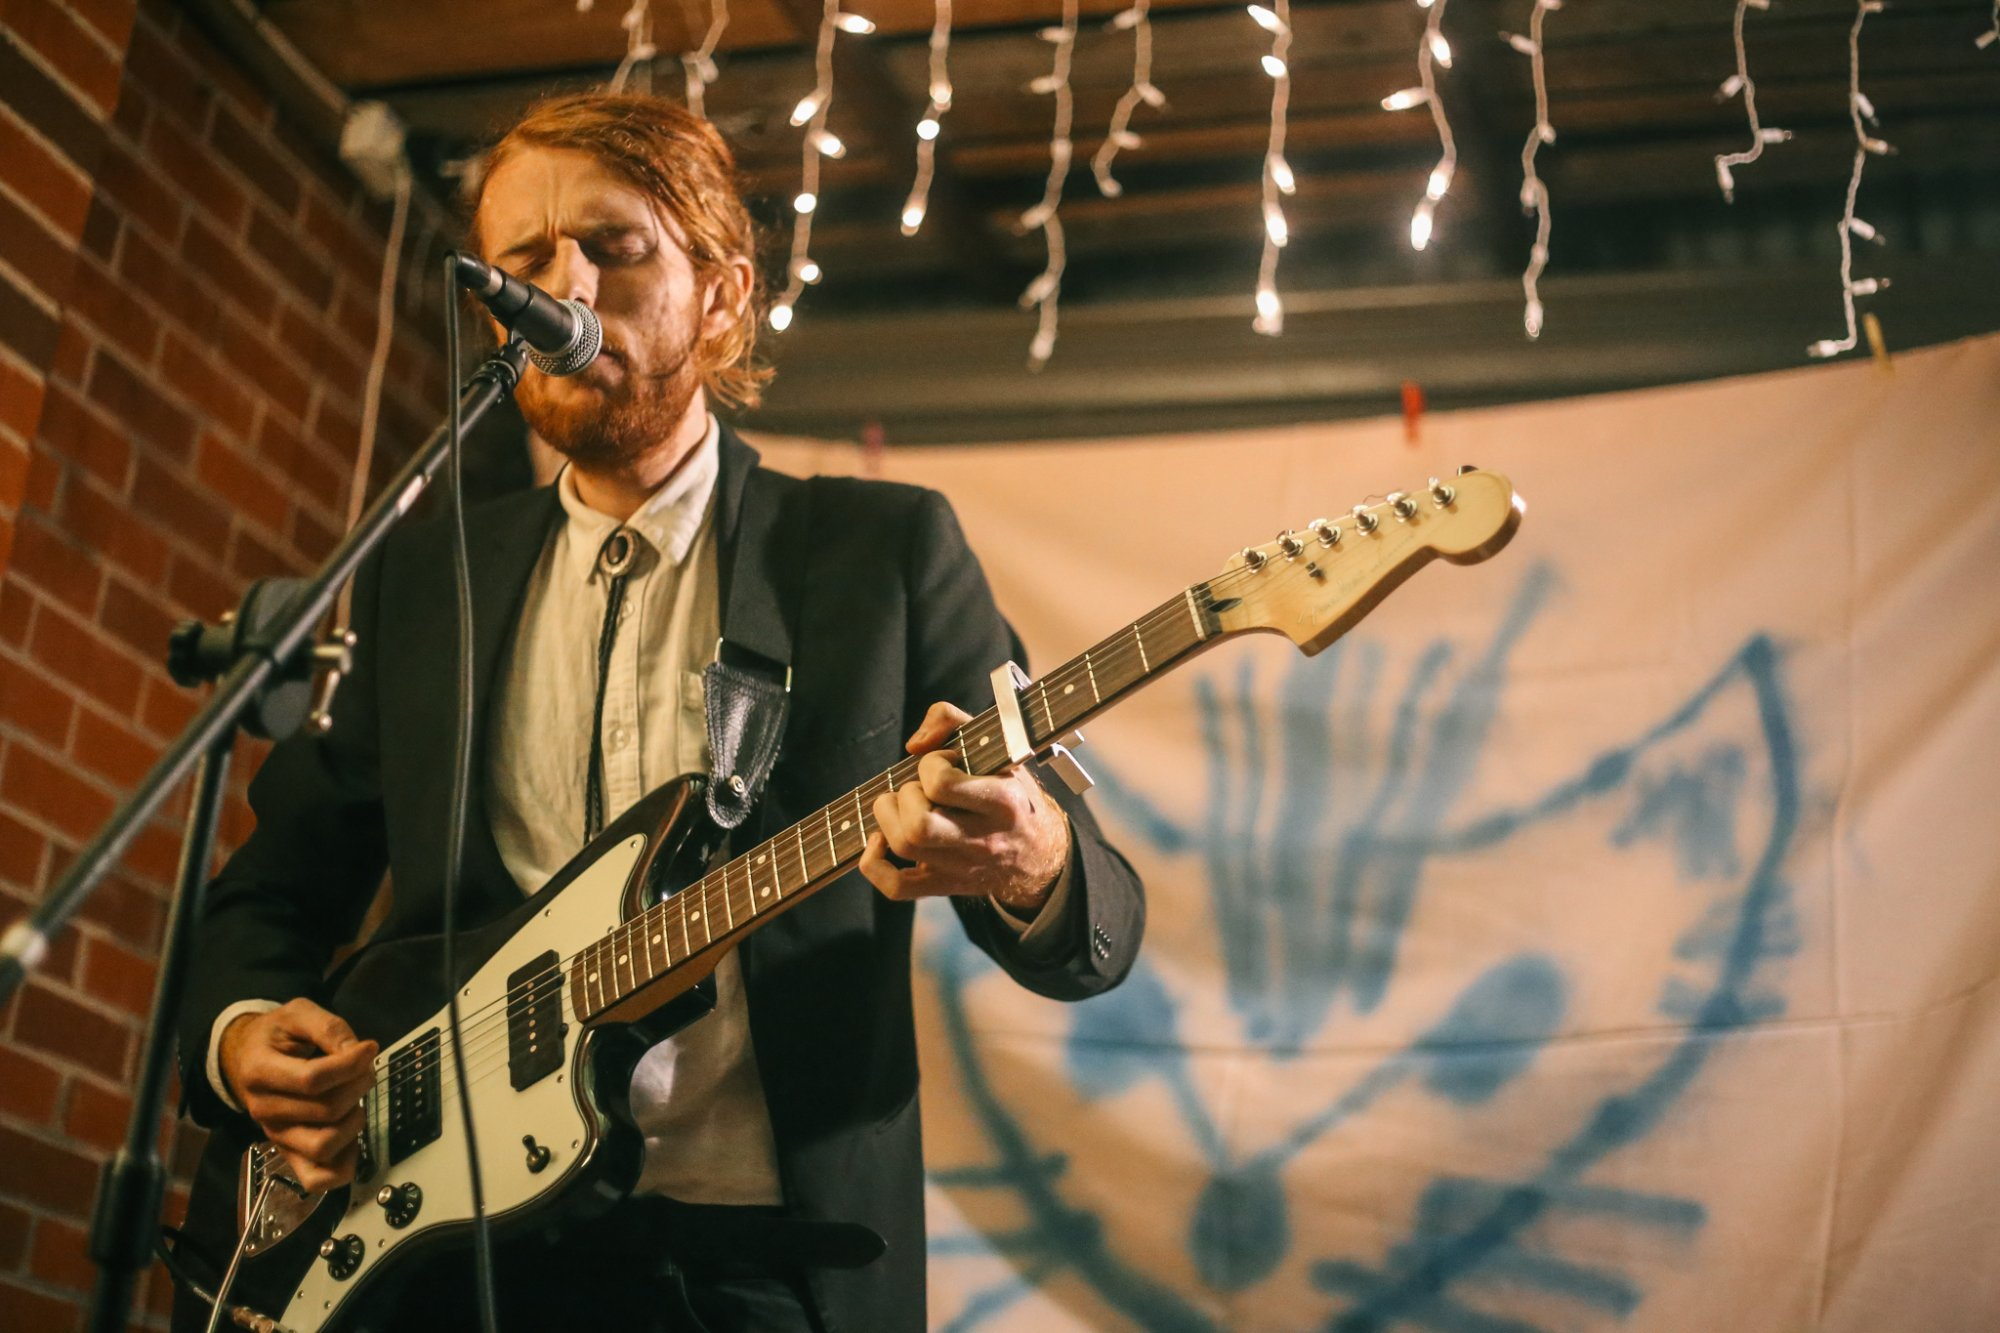 Patrick J. Johnson playing at a Mulgara Show. Patrick is playing friday night at No Front Fences. Photo by Dave McCarthy